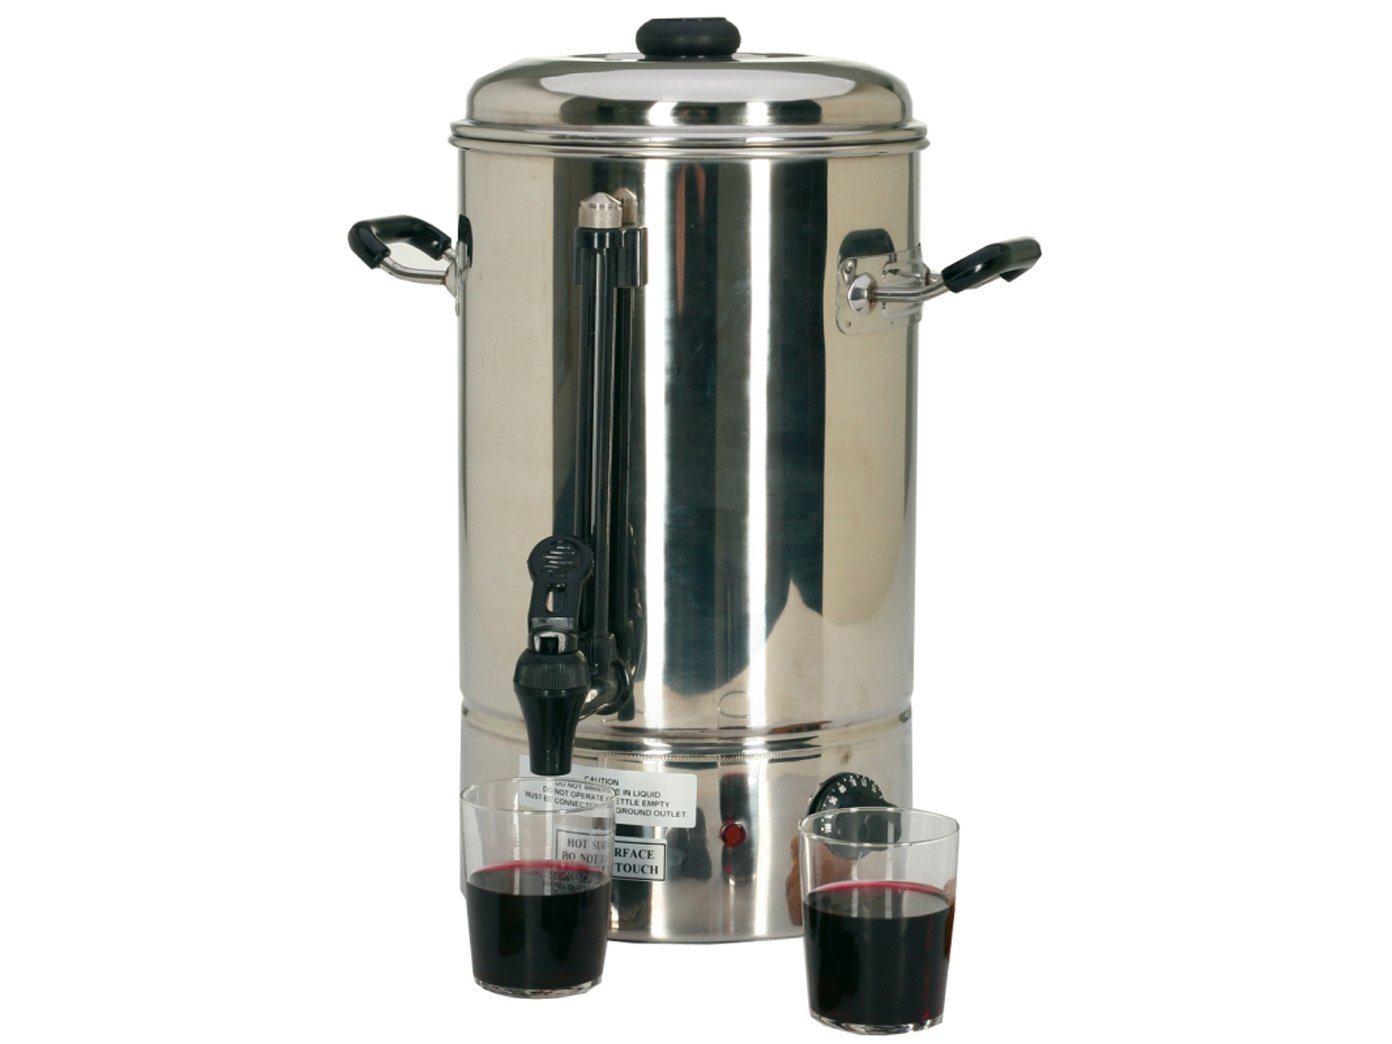 Professionale di heissgetr aenke Dispenser in acciaio inox, 10litri, 1500Watt; WB 10GGG